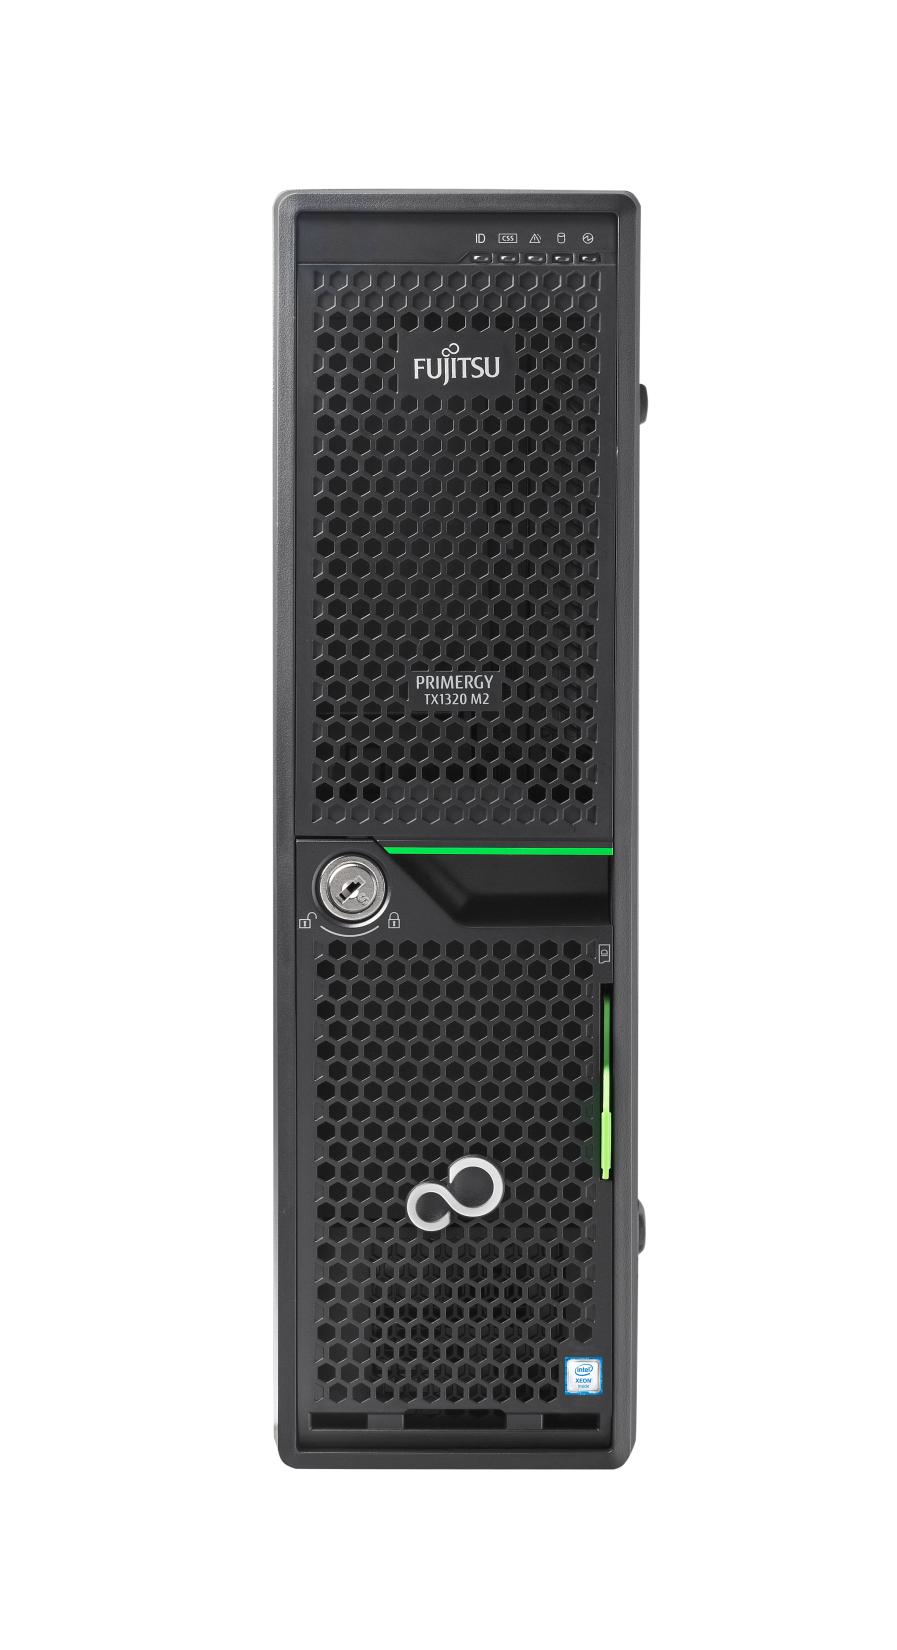 Fujitsu Primergy TX1320M2/SFF/E3-1220v5 4C/4T 3,0GHz/8GB/DRW/bez HDD/Raid 0,1,10/2xGL